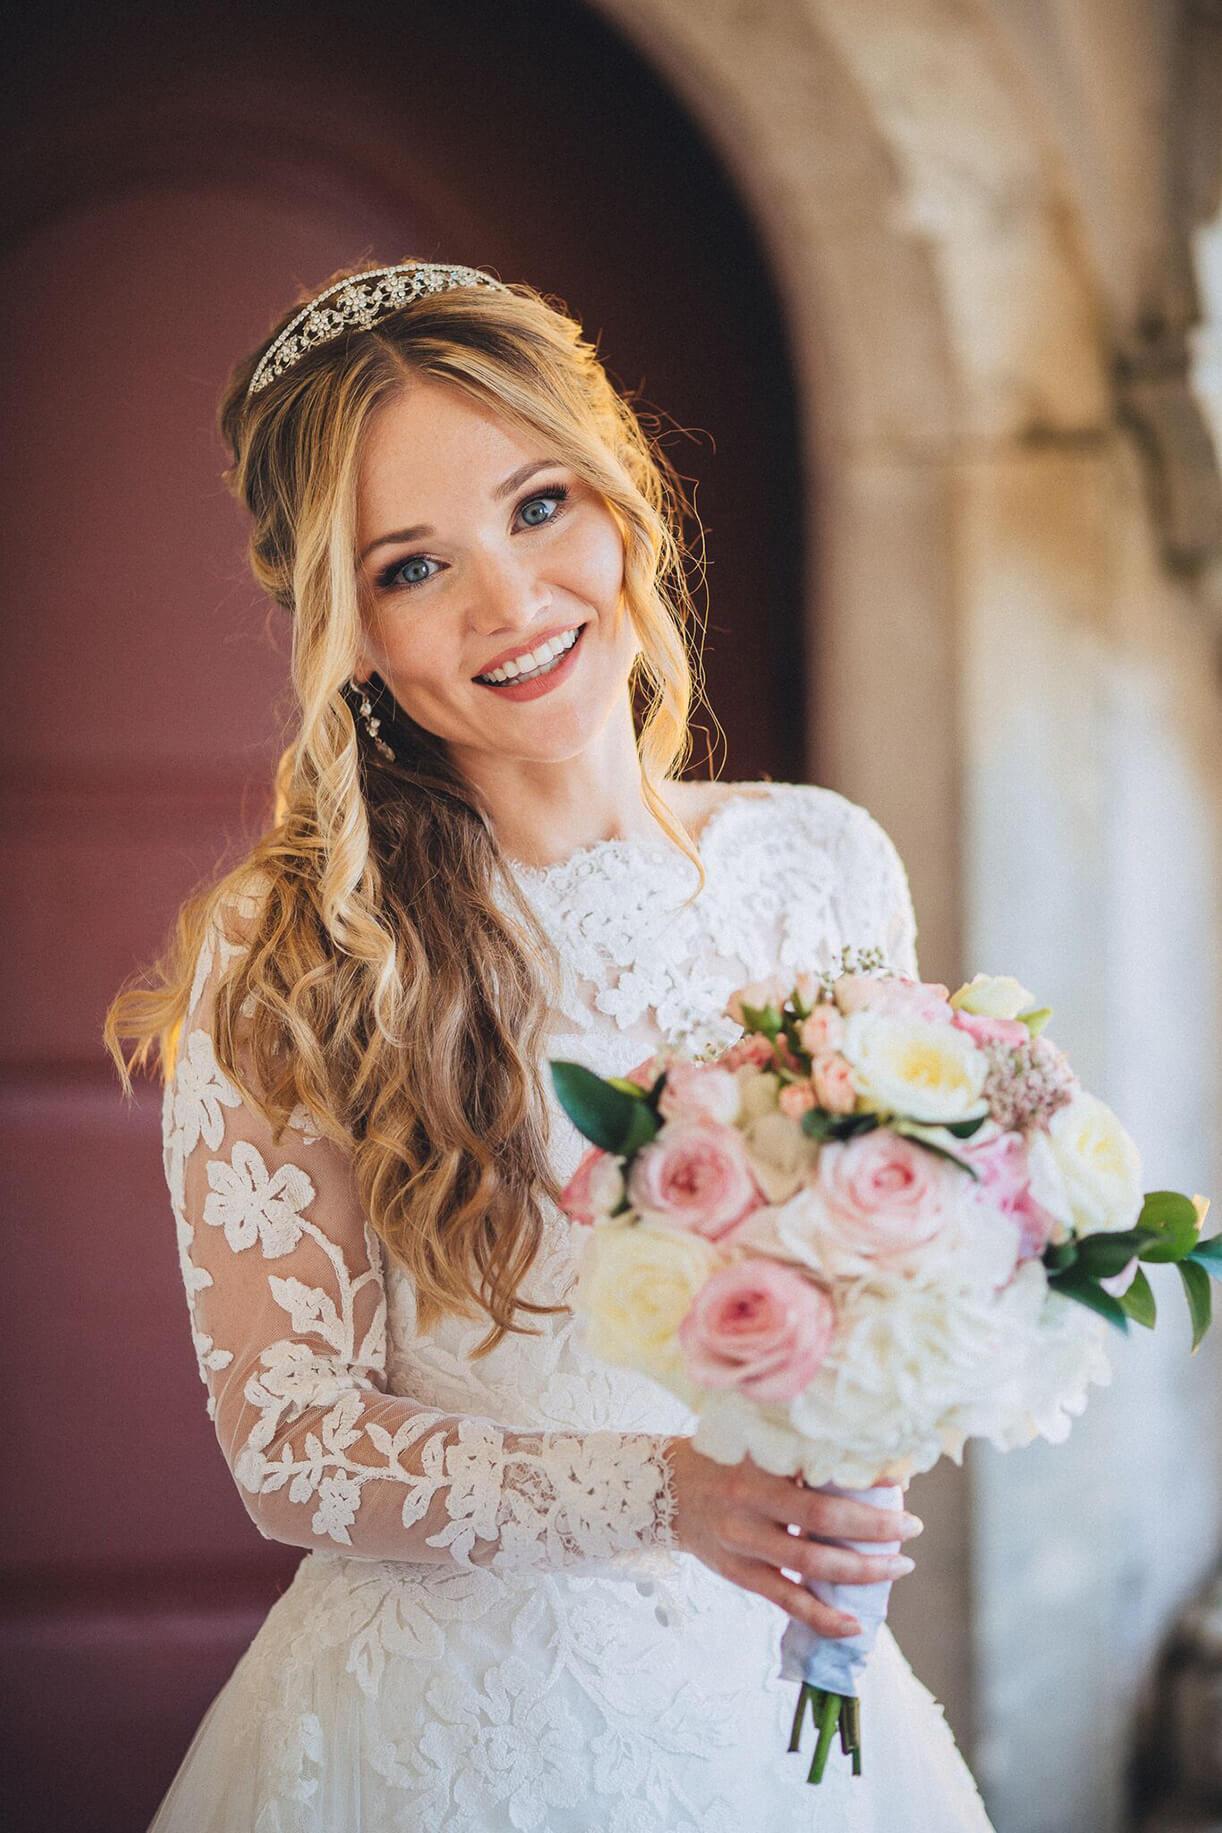 Невеста в свадебном образе с букетом на фоне